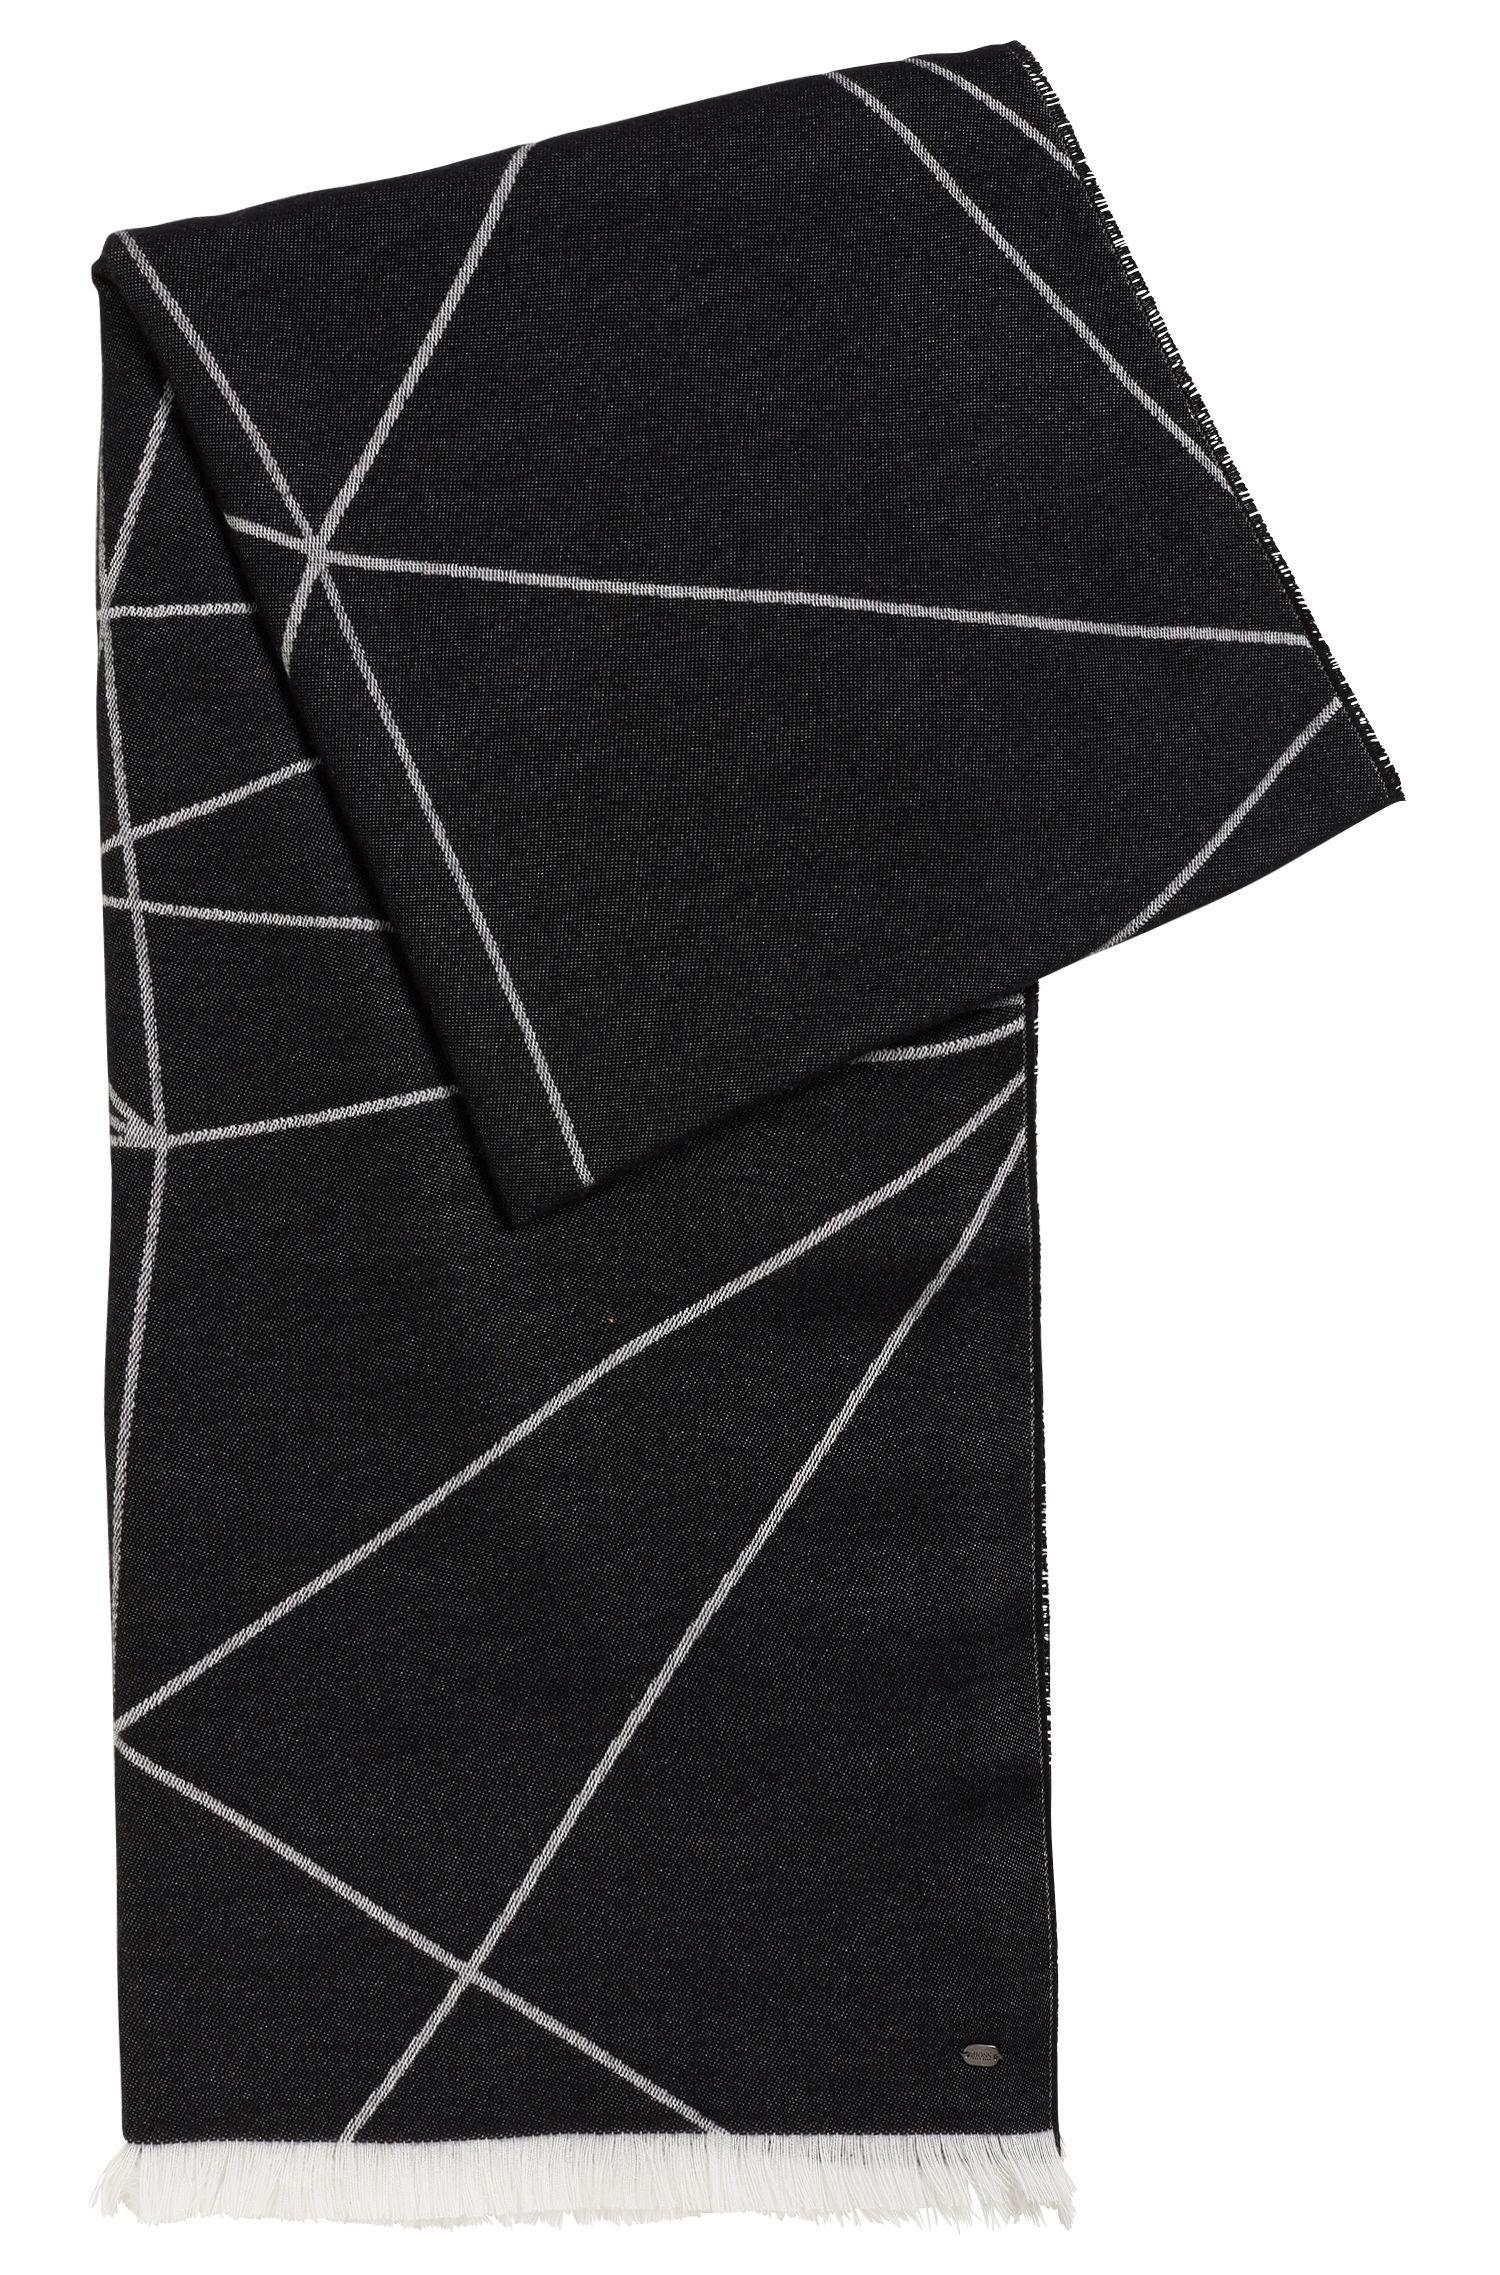 'Scarf Jacquard' | Geo-Print Stretch Cotton Scarf